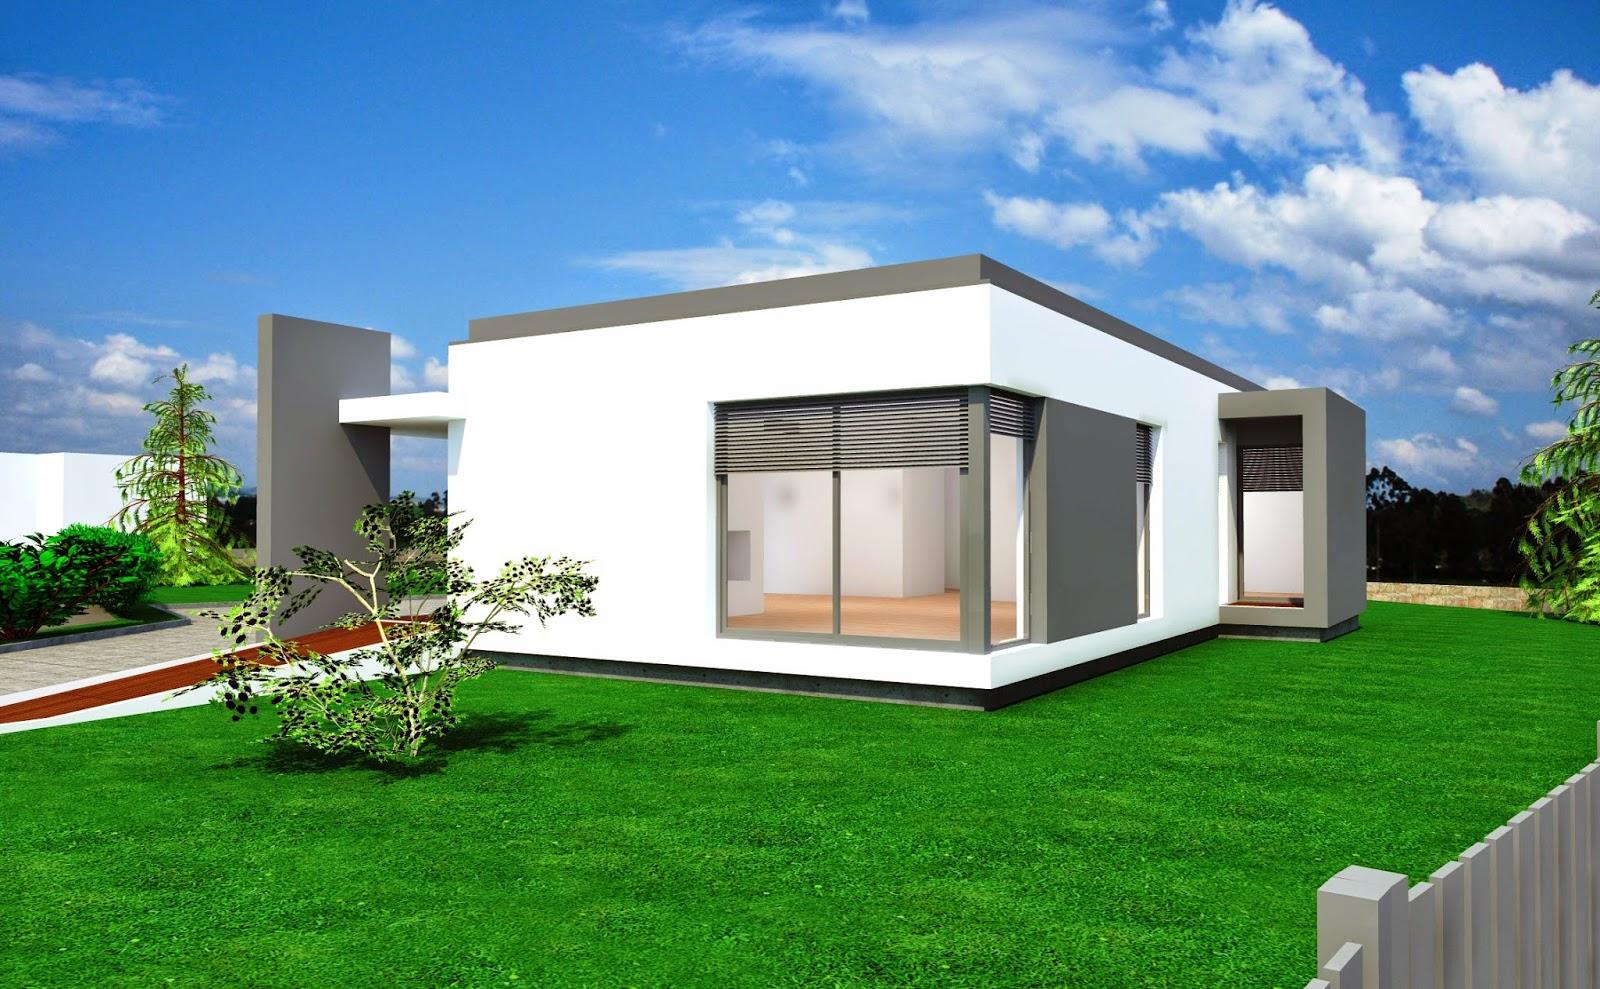 Casas modulares steel houses steel houses arouca - Casas modulares portugal ...